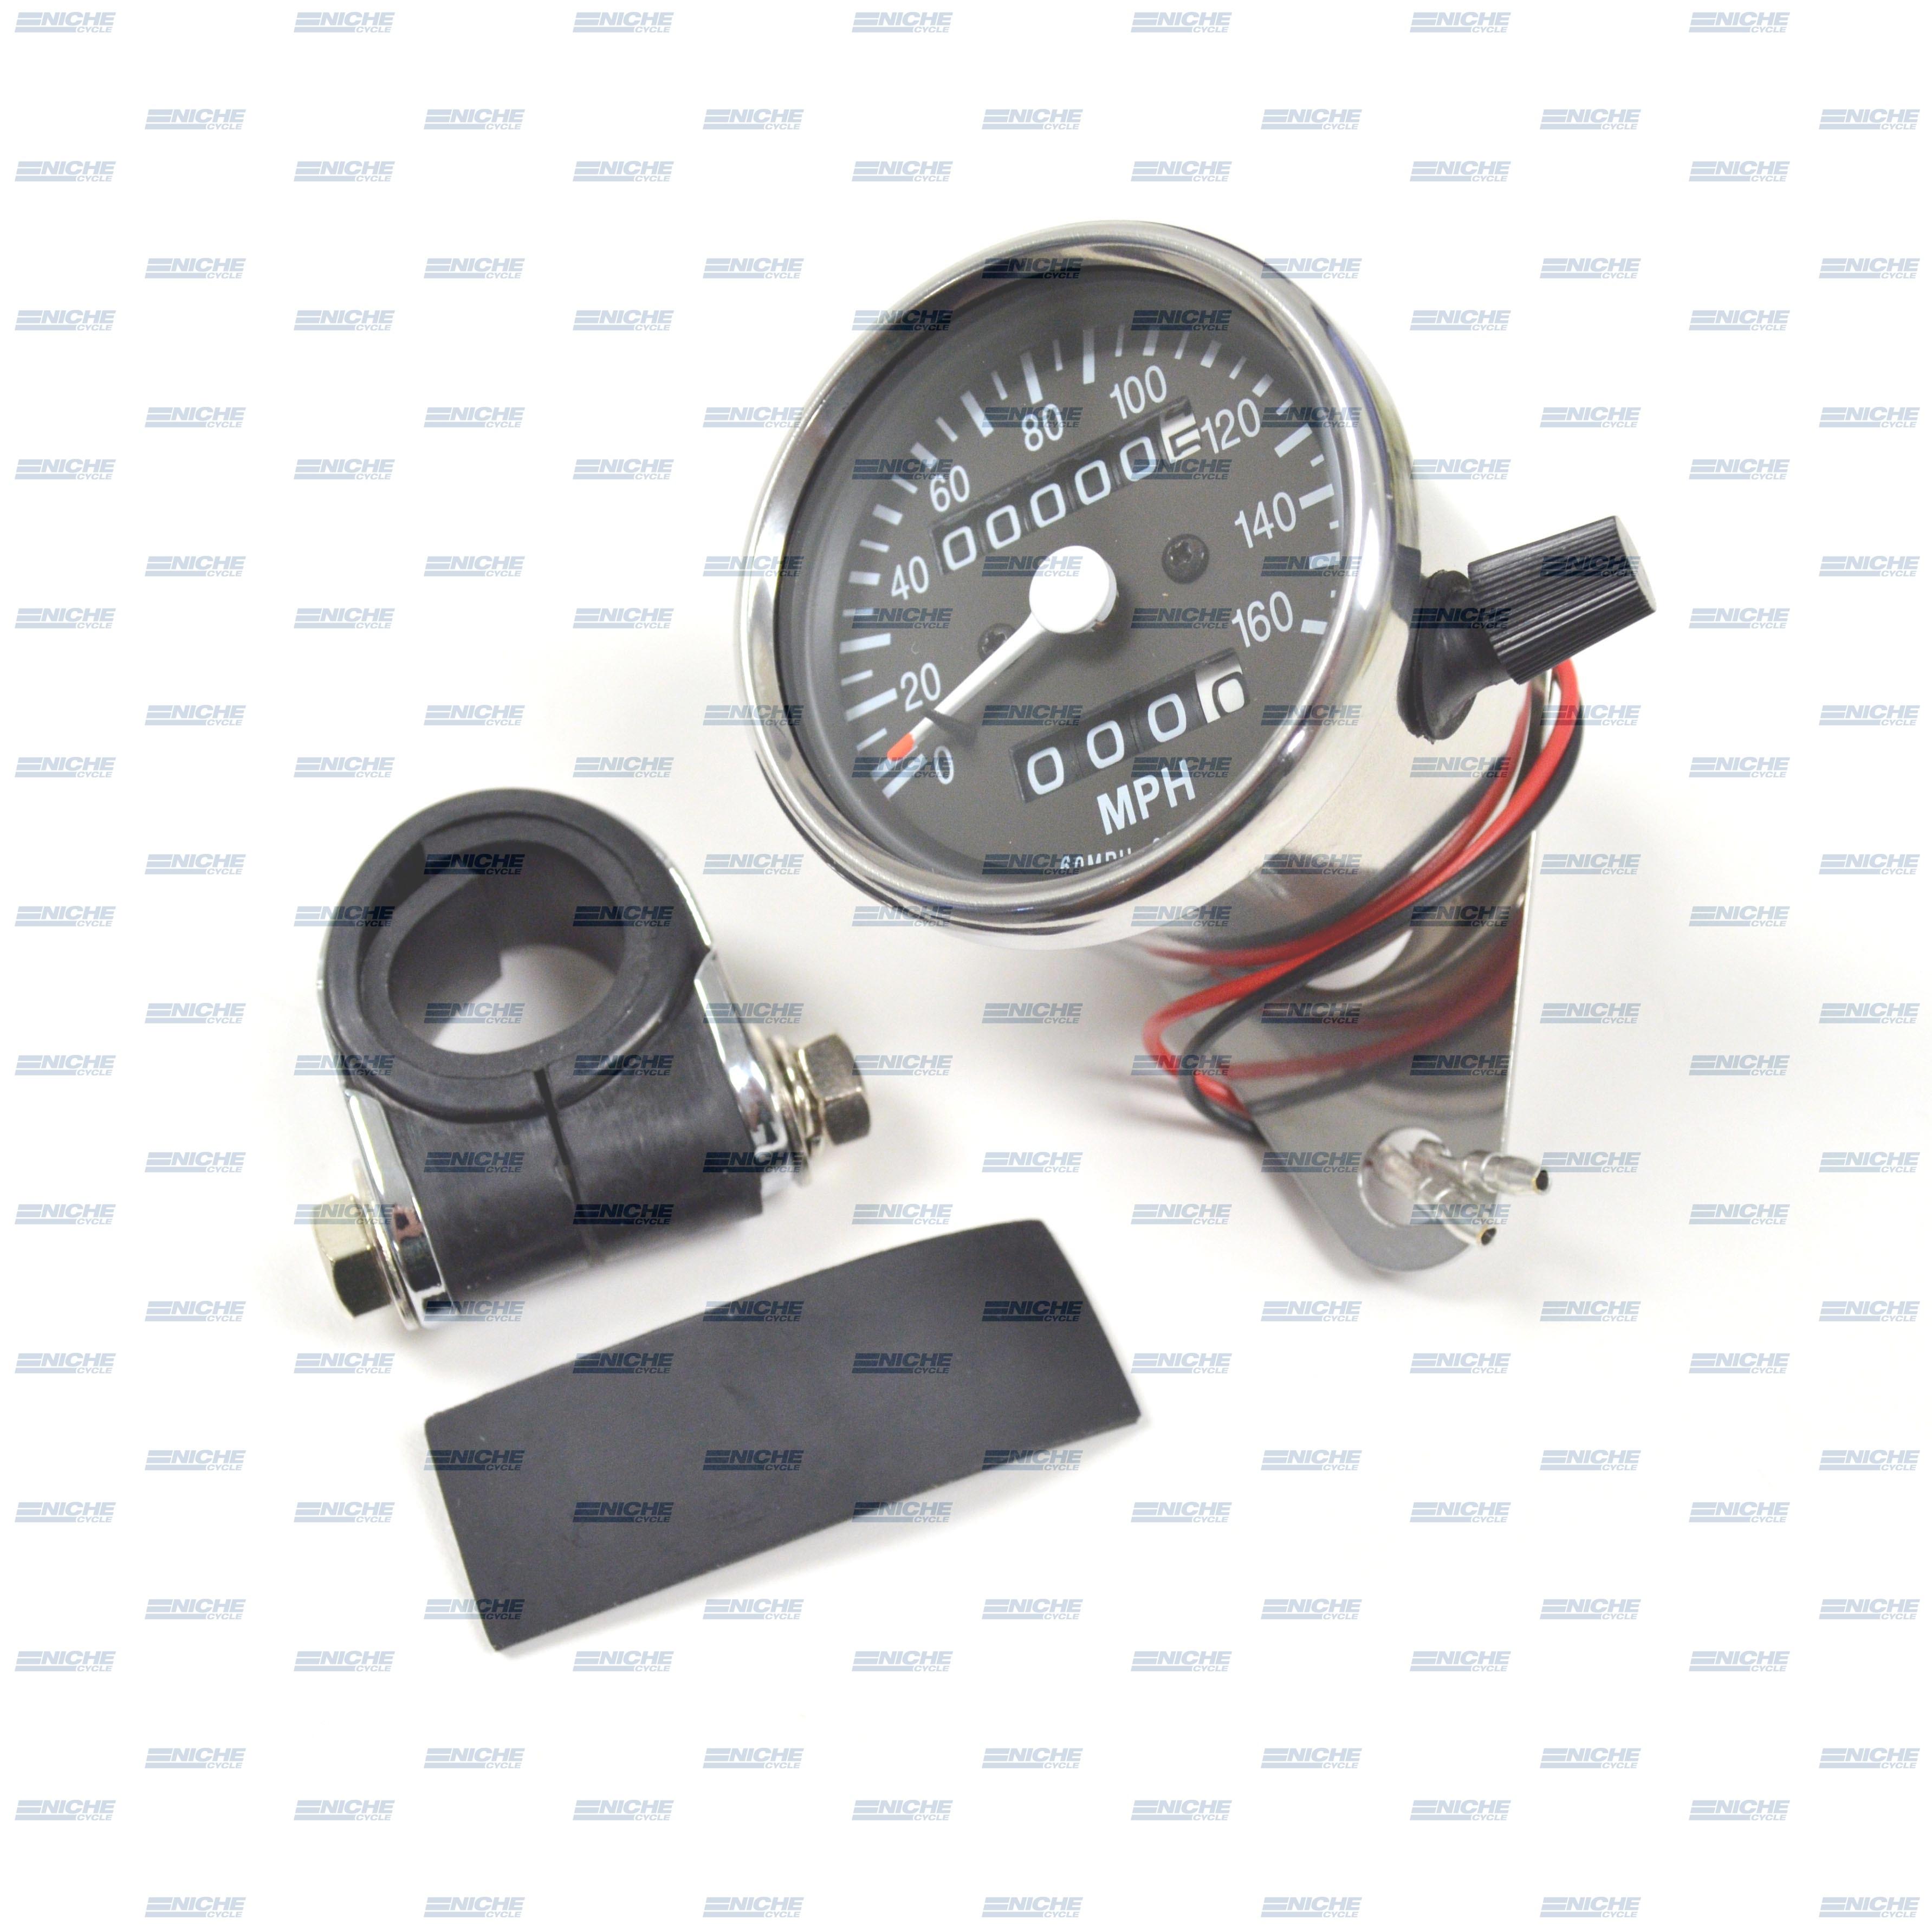 Mini Speedometer Gauge w/Bar Clamp 160 MPH - 2.1:1 Ratio 58-43667